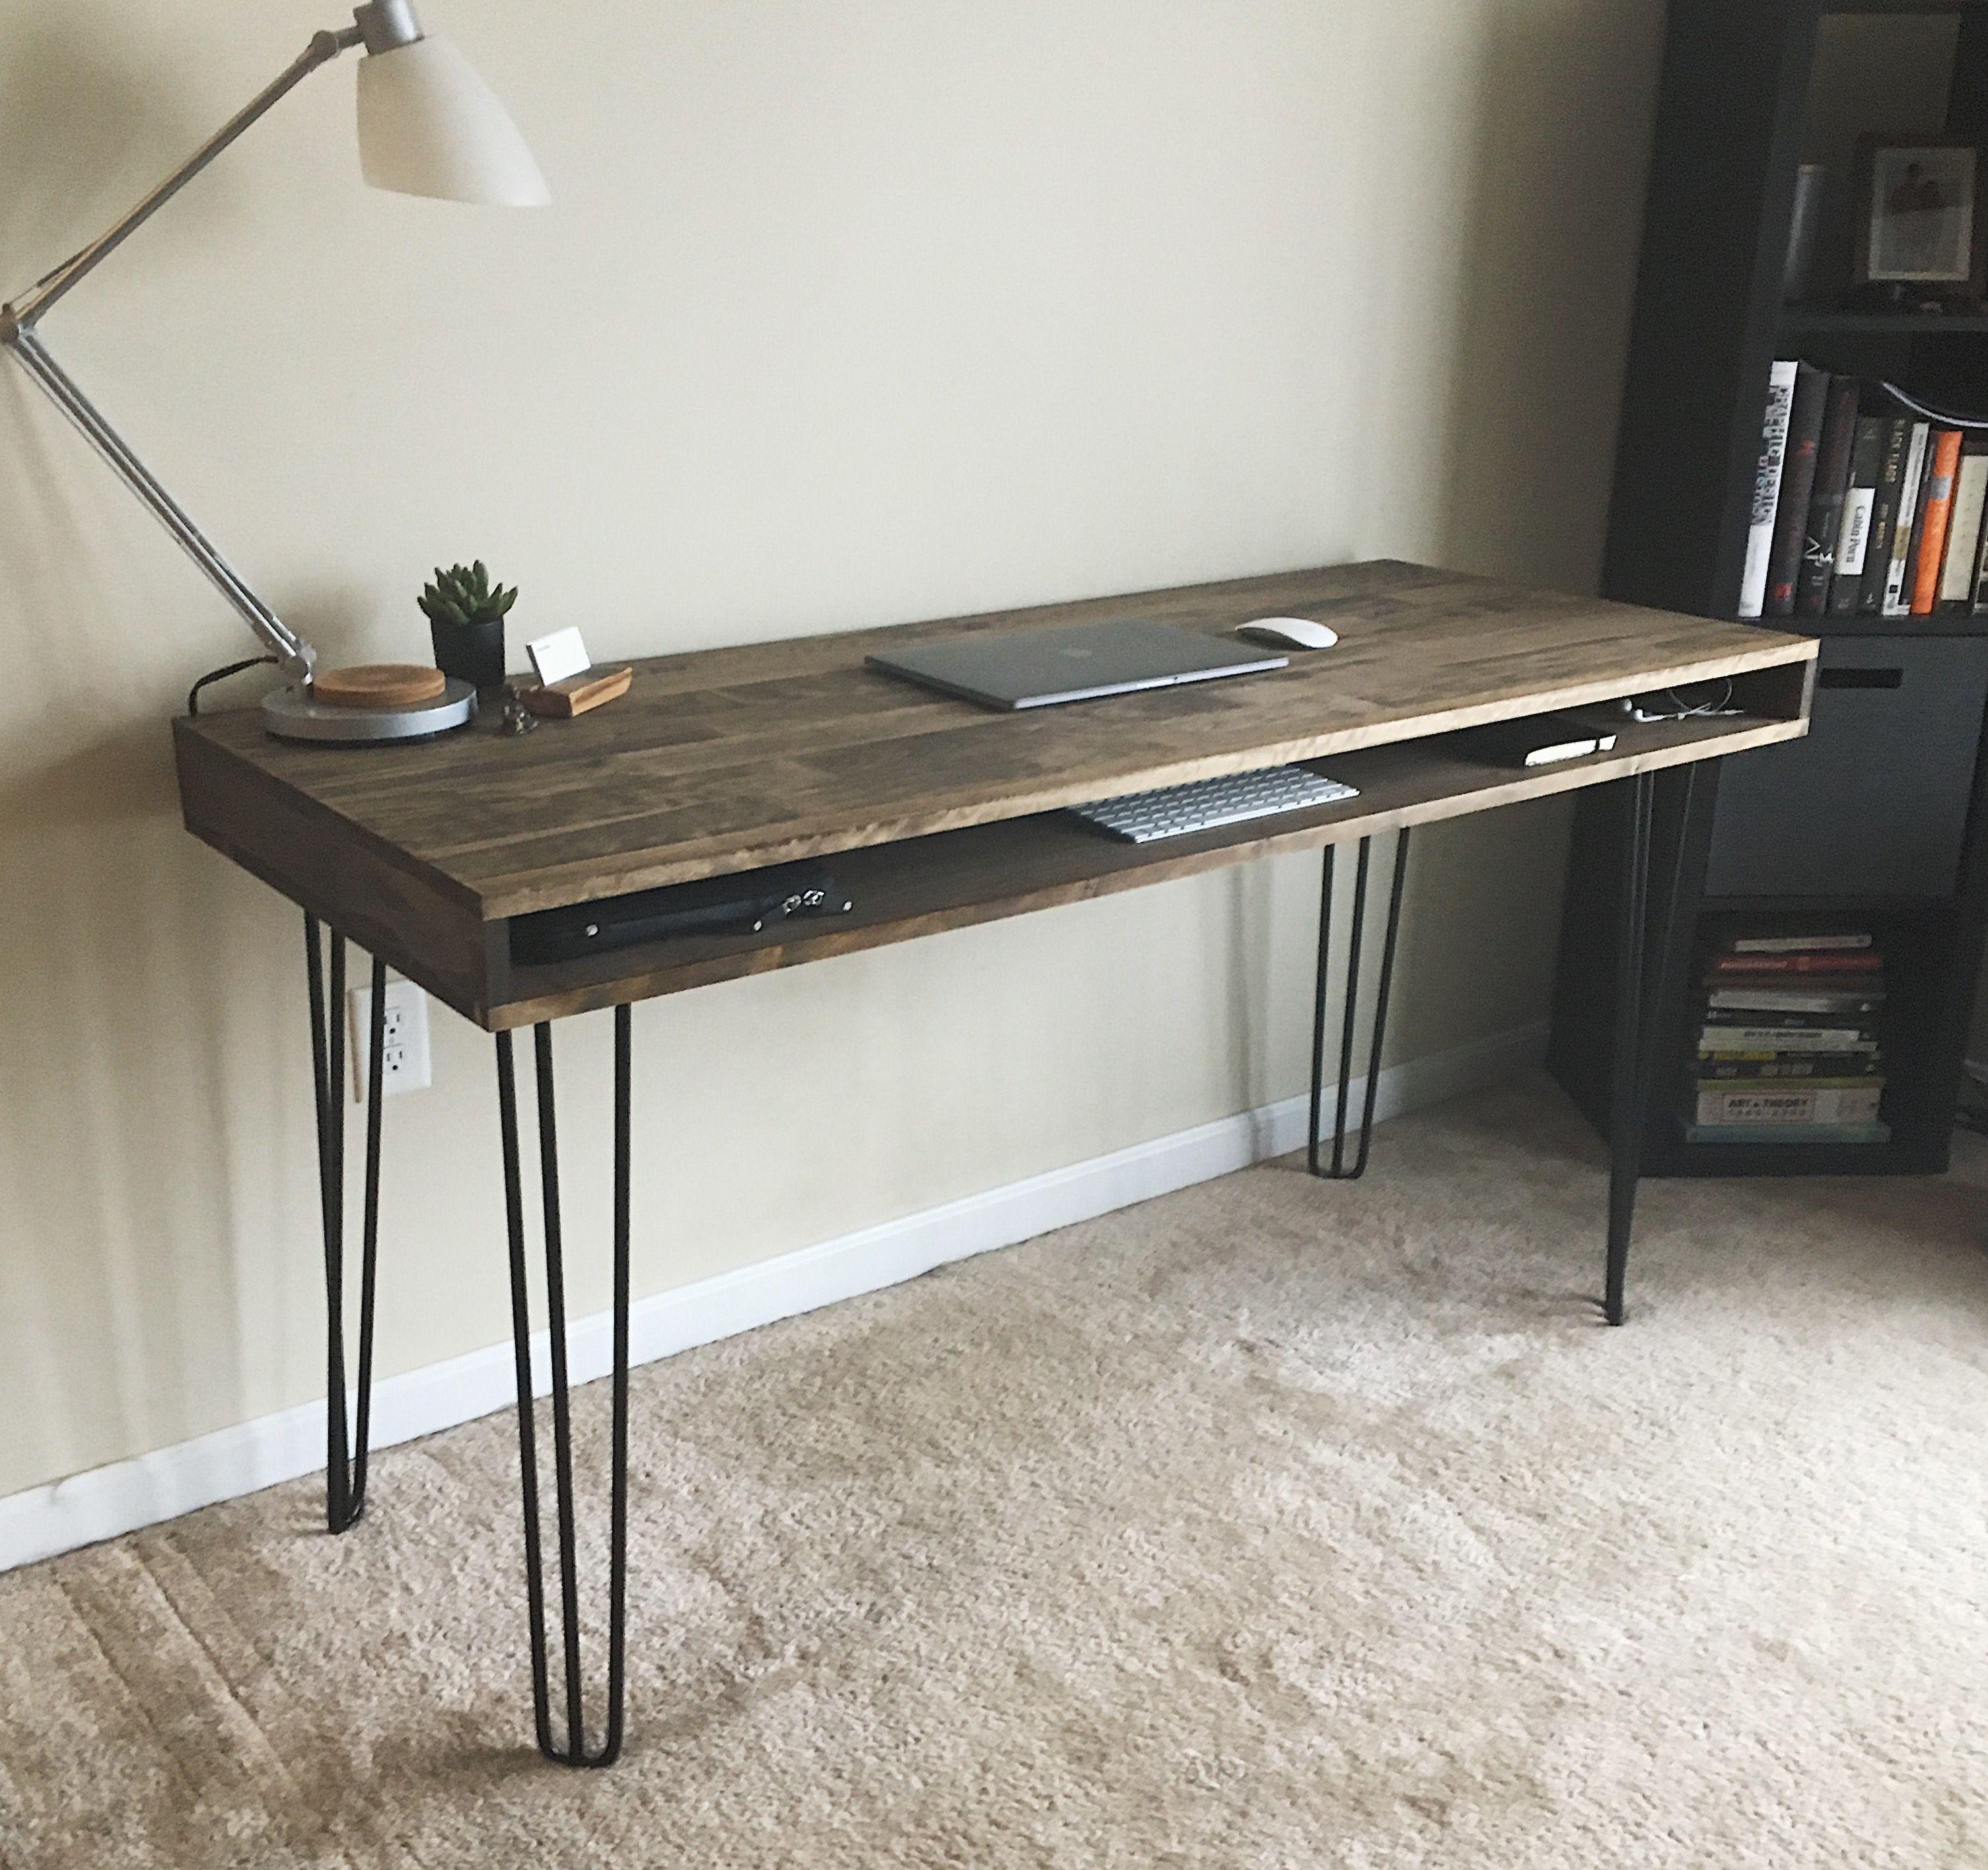 Diy Modern Hairpin Leg Desk 60 X 24 Diy Computer Desk Home Office Setup Diy Furniture Projects